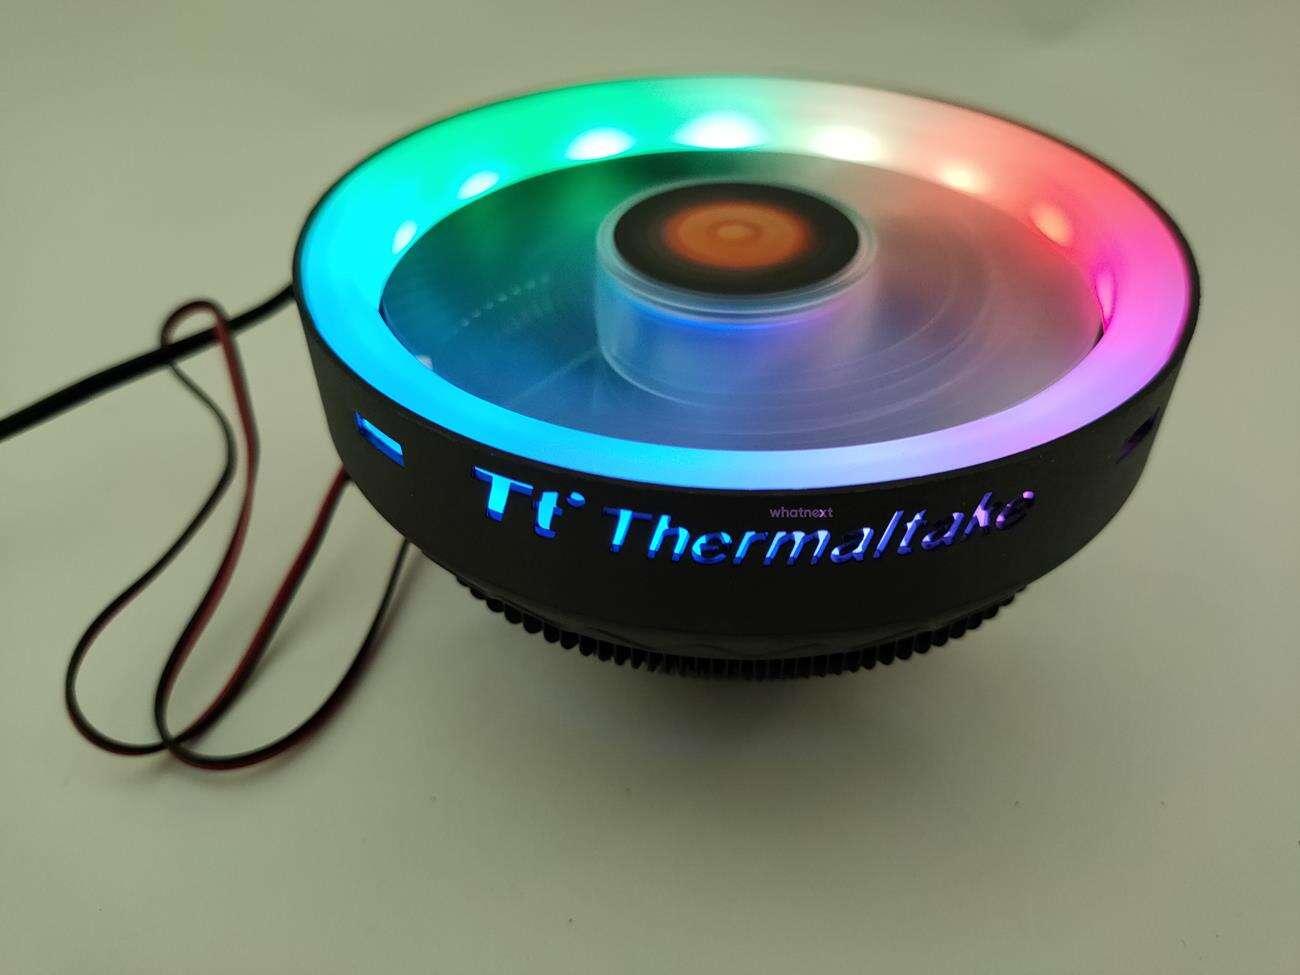 test Thermaltake UX100 ARGB, recenzja Thermaltake UX100 ARGB, review Thermaltake UX100 ARGB, opinia Thermaltake UX100 ARGB, cena Thermaltake UX100 ARGB